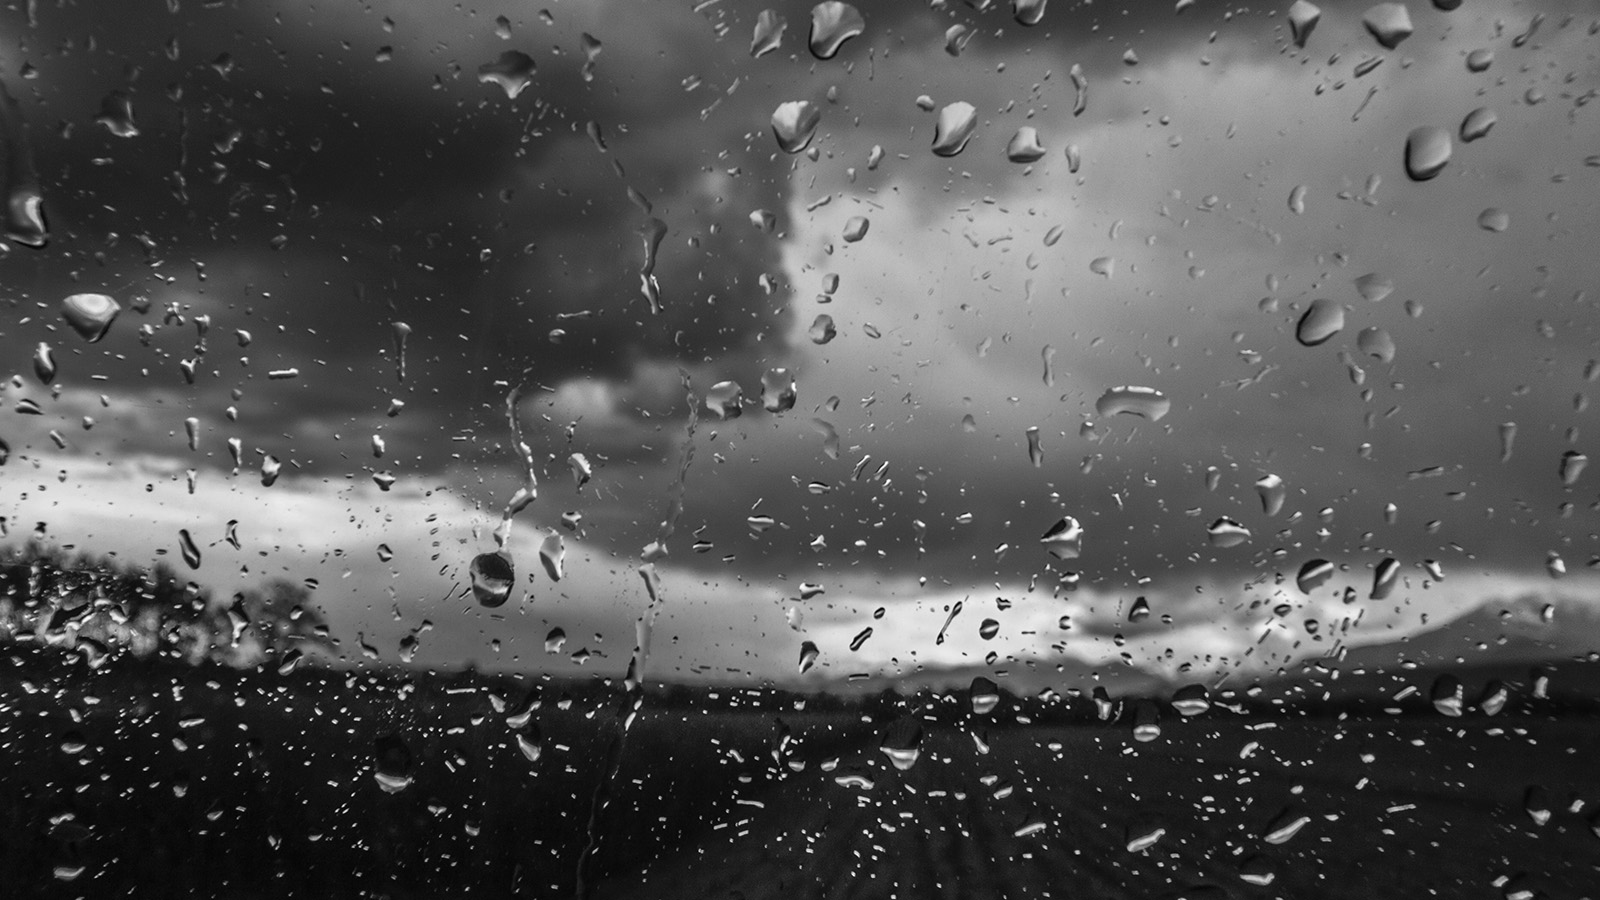 1680 x 1050 - Rainy window wallpaper ...